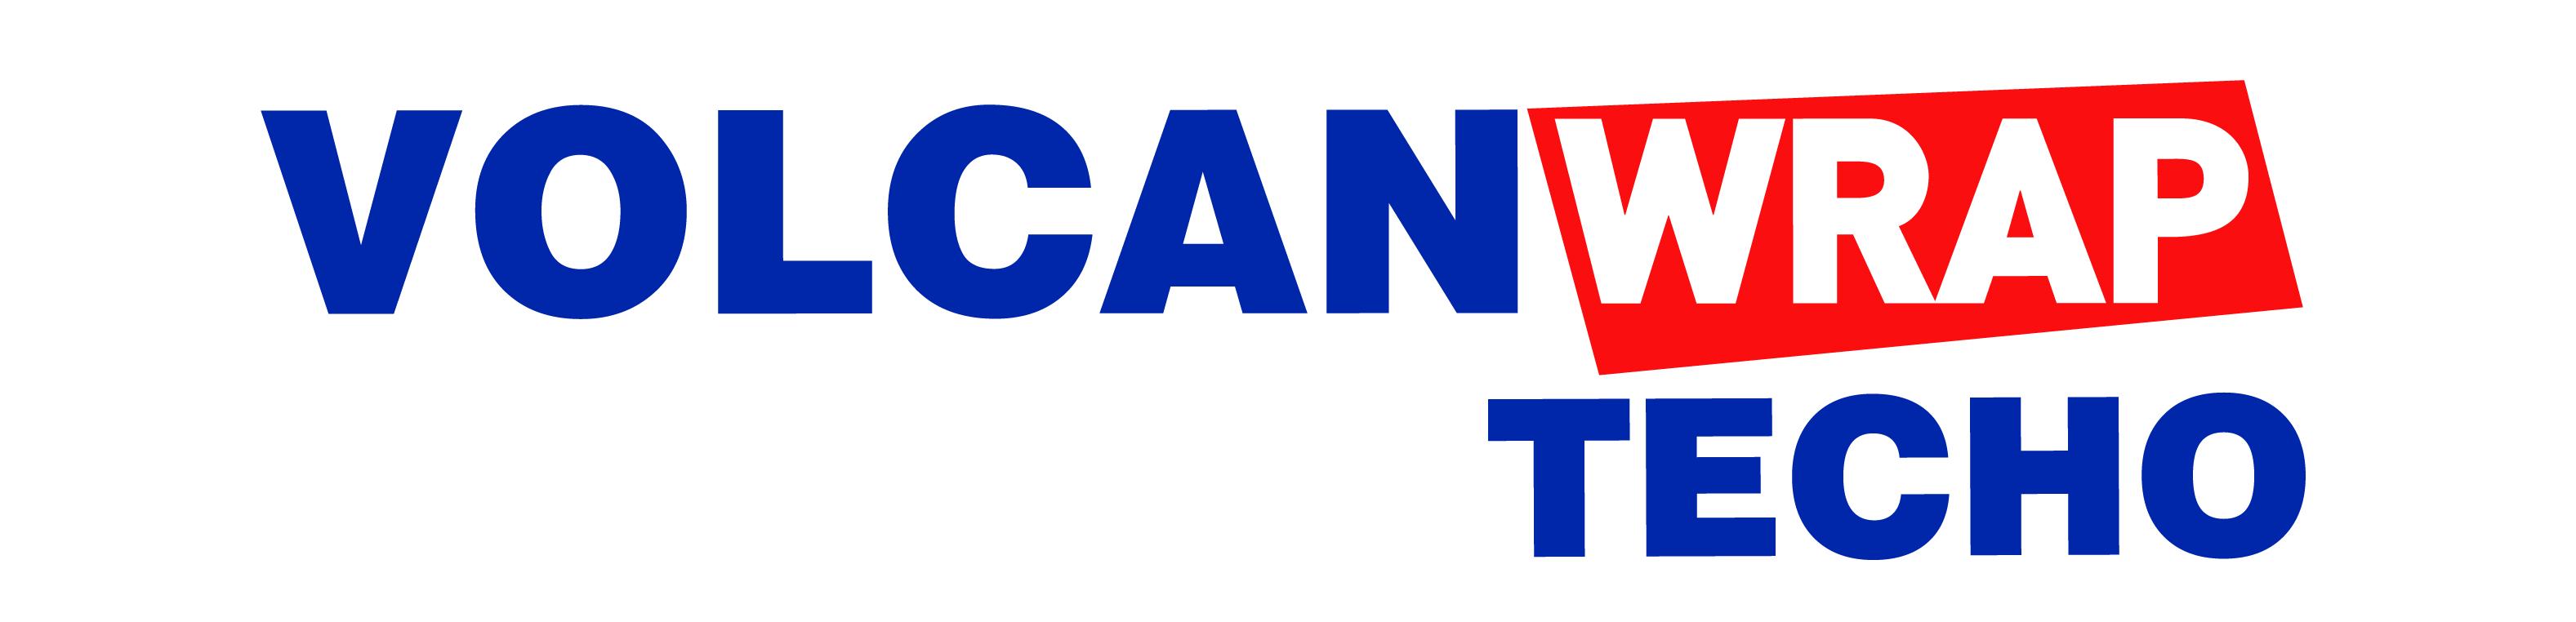 logotipo volcanwrap techo membrana hidrofoba